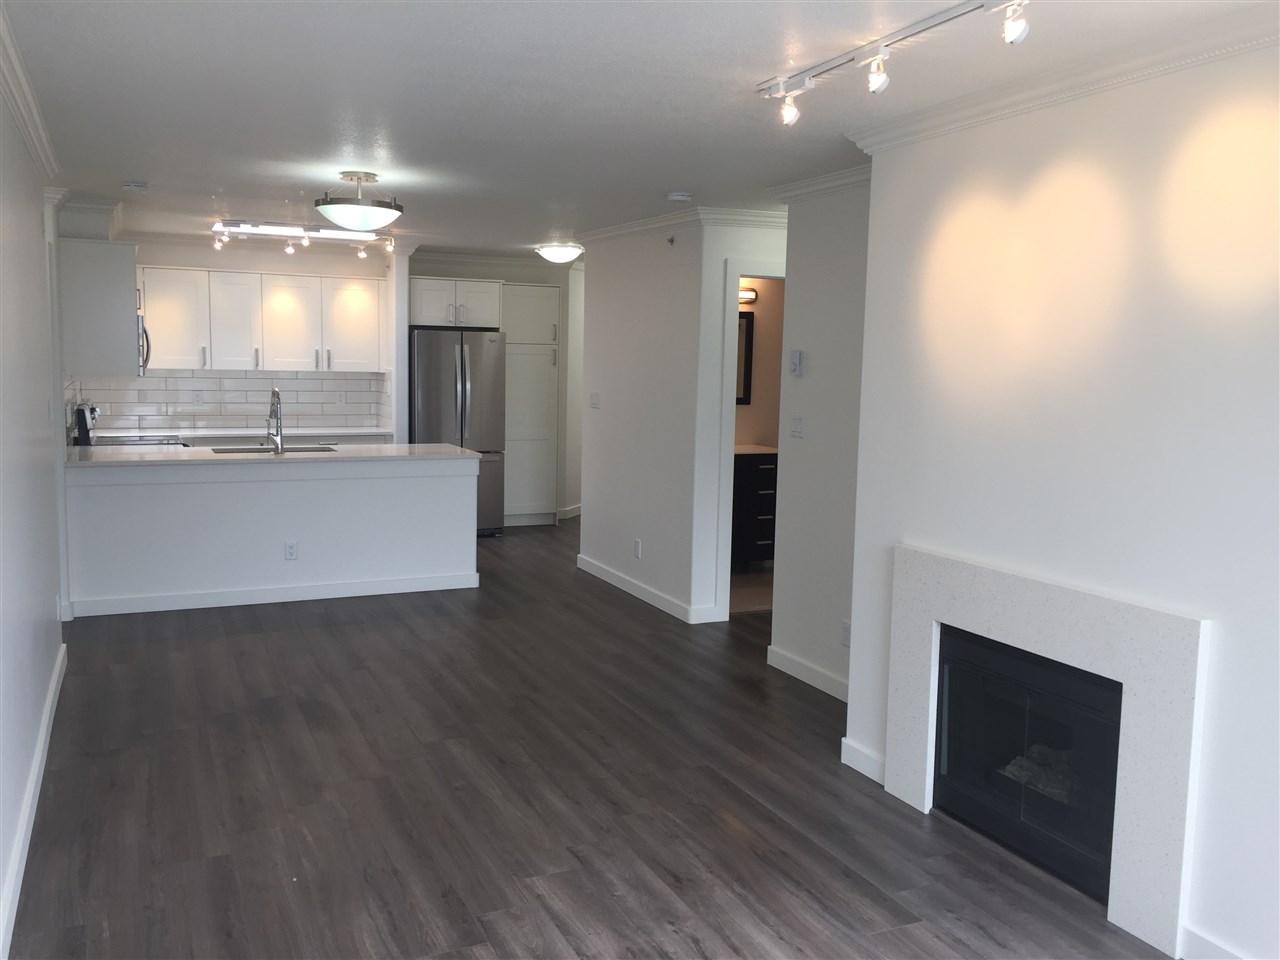 Condo Apartment at 312 1119 VIDAL STREET, Unit 312, South Surrey White Rock, British Columbia. Image 1